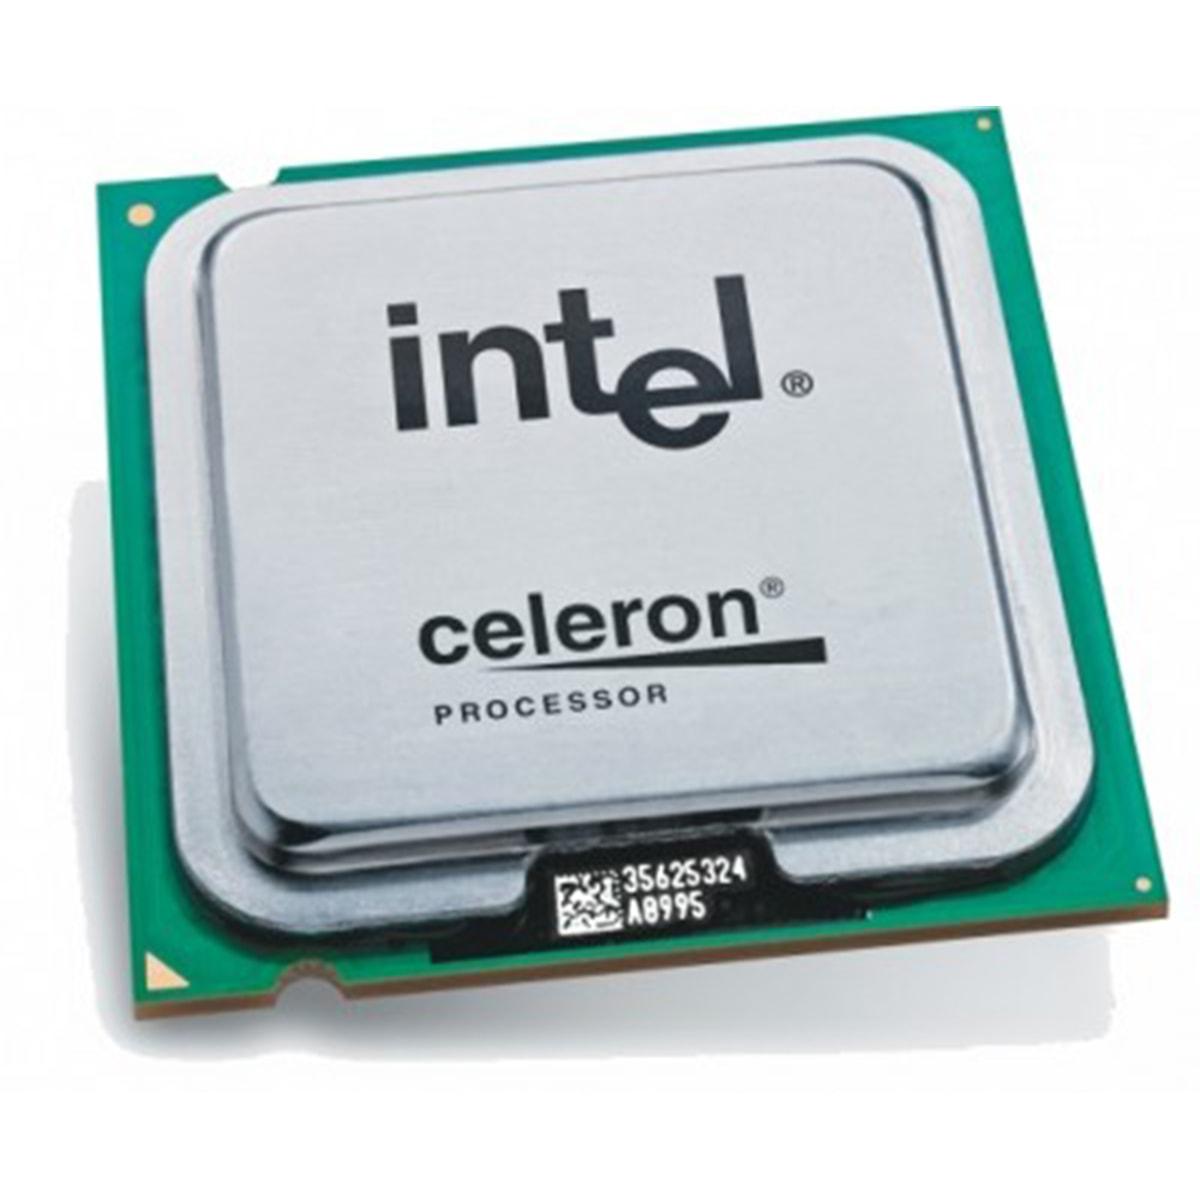 Processador Intel Celeron 430 1,80Ghz 512Kb Cache 800MHz - Socket 775 - Seminovo